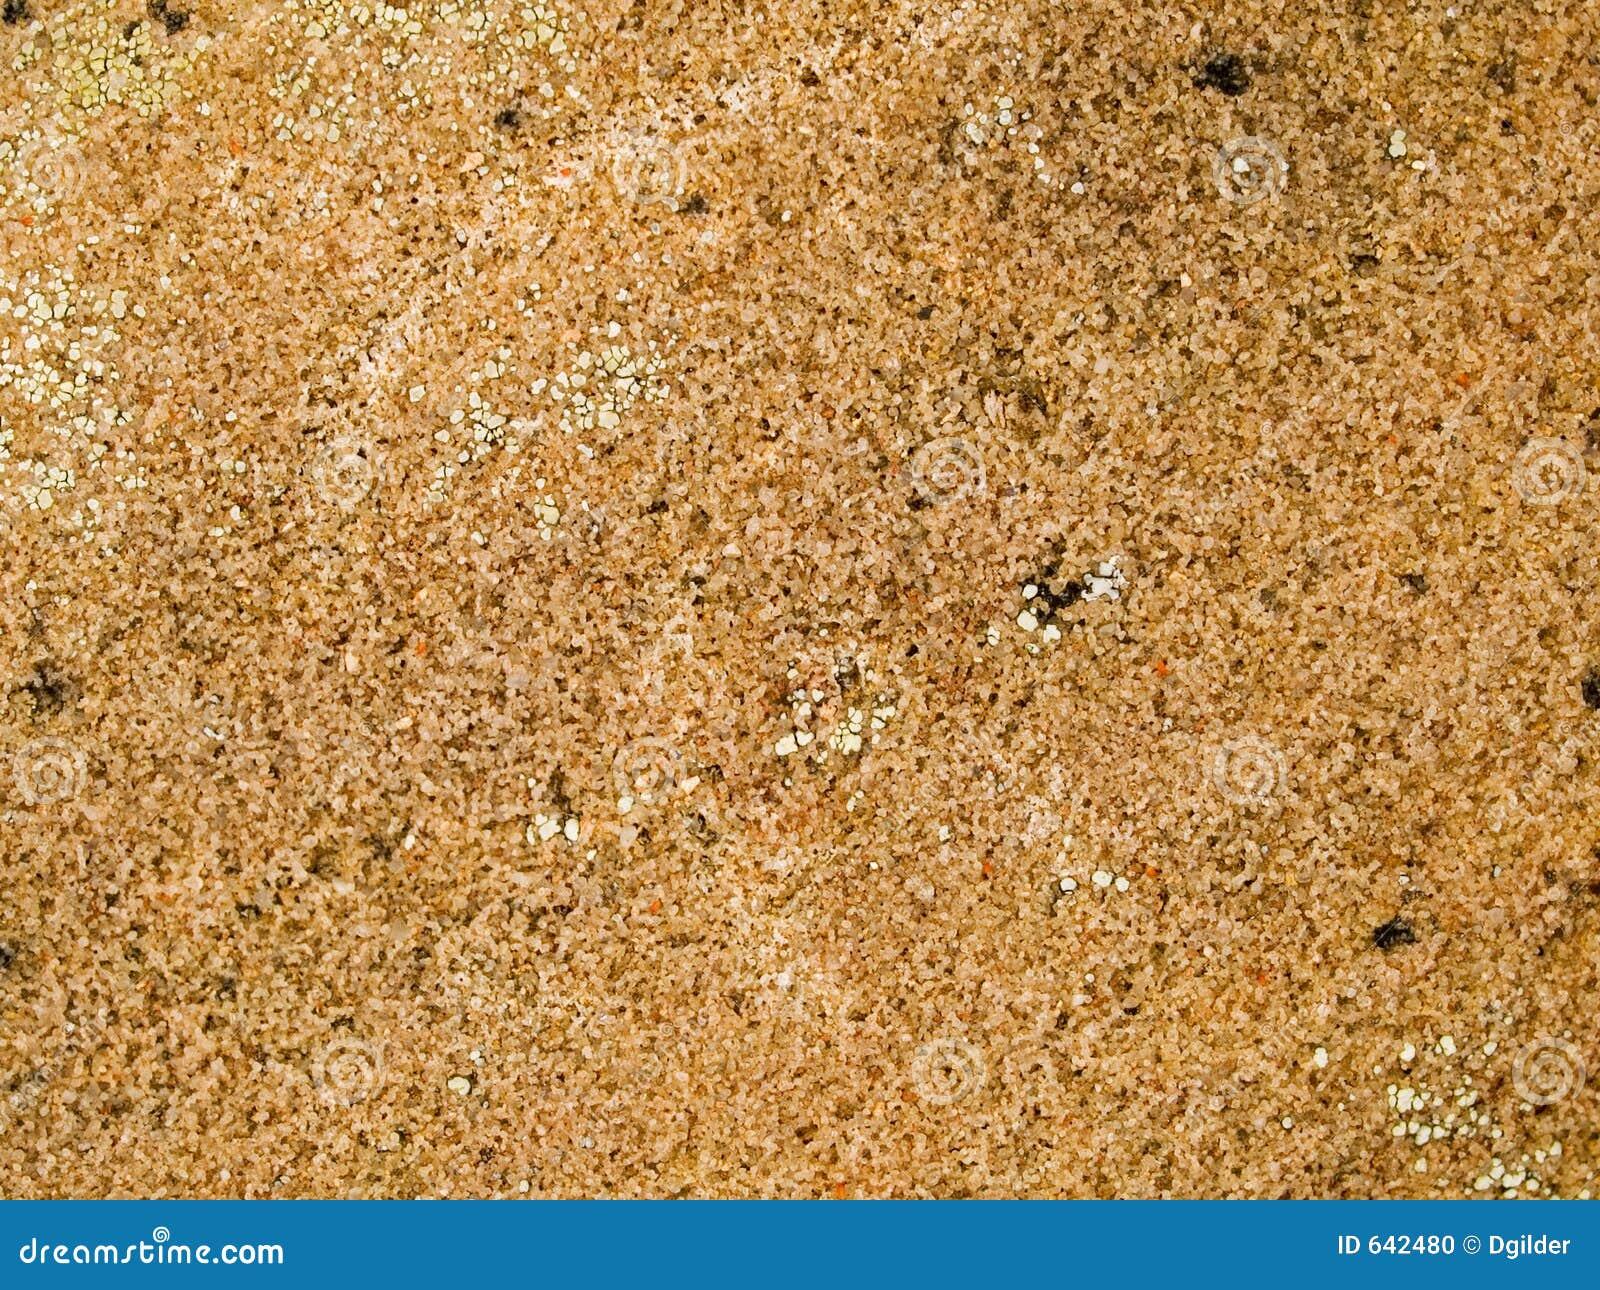 Textura macra - piedra - abigarrada